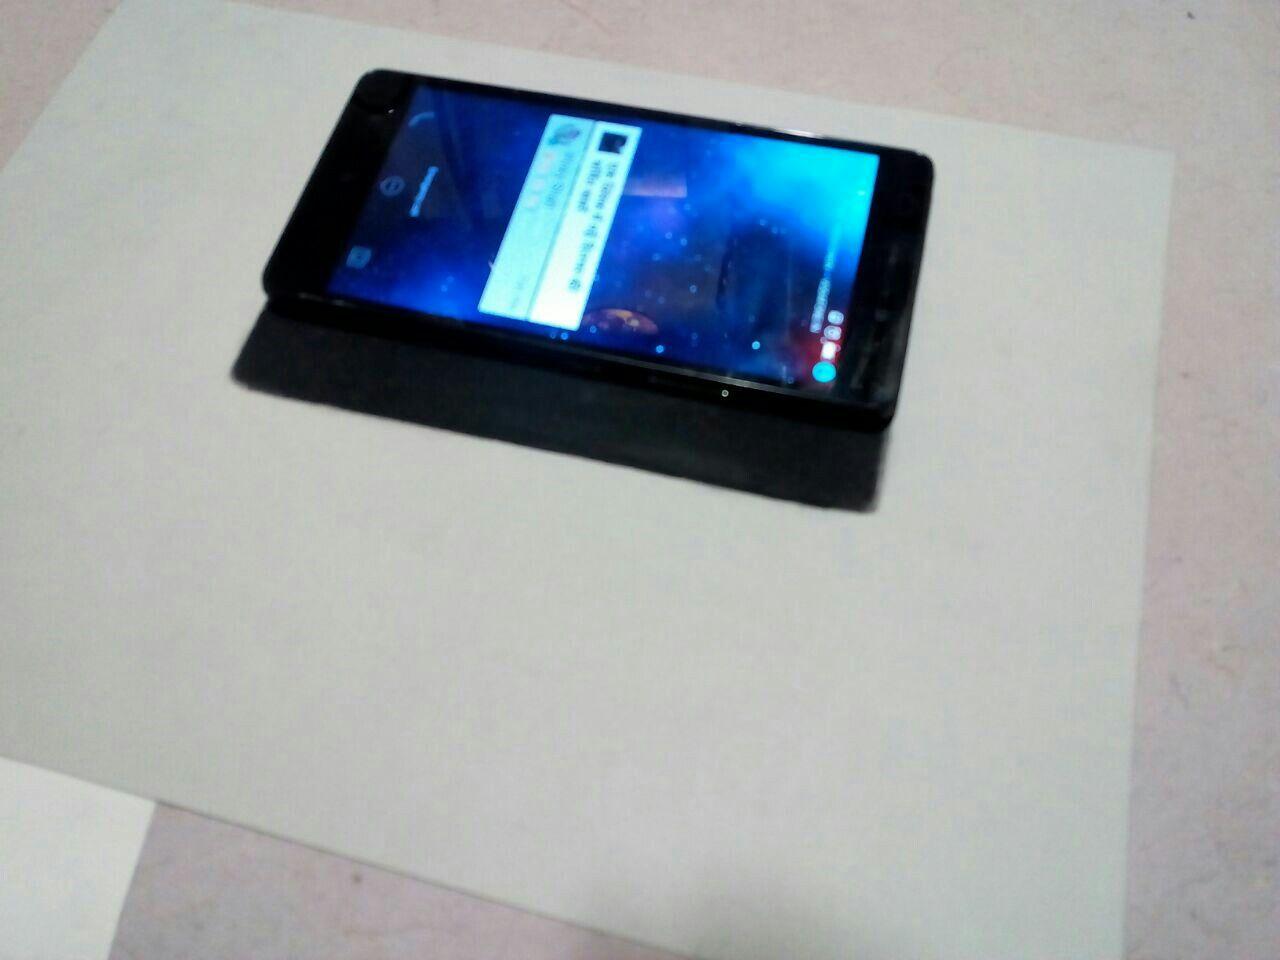 My smart phone Levitate !